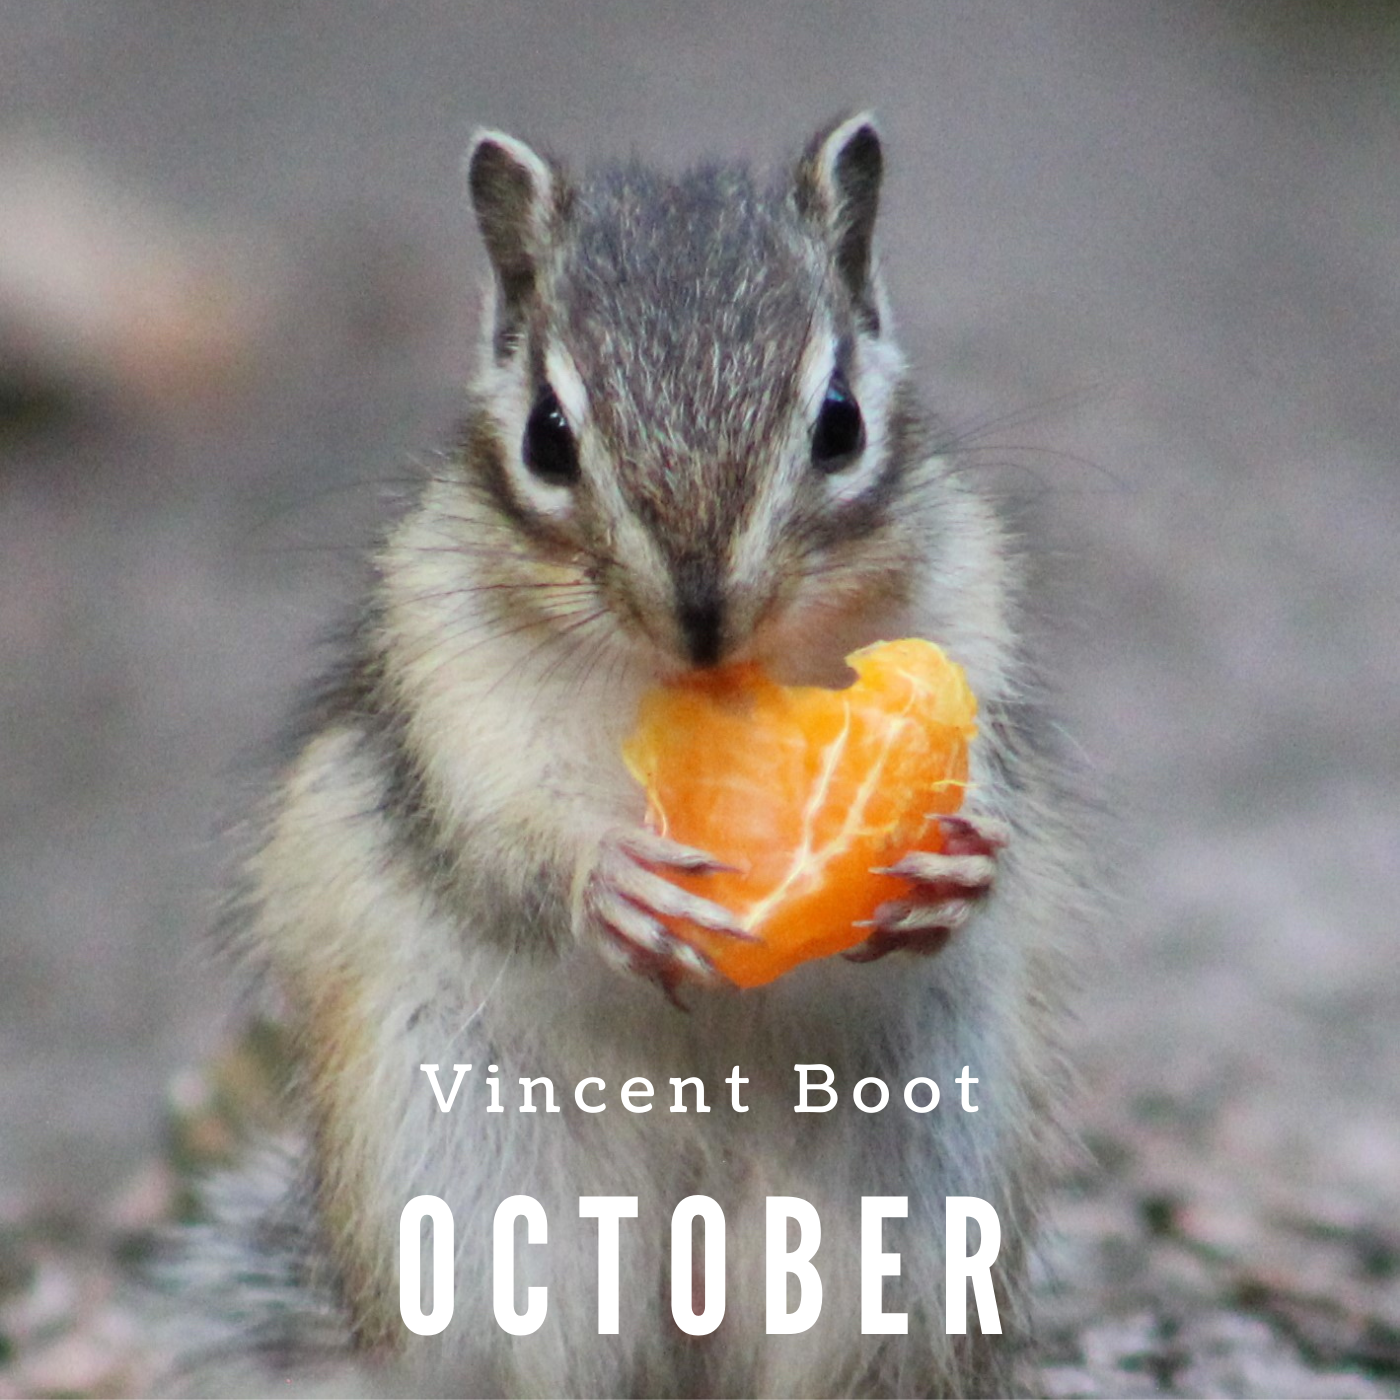 Vincent Boot - October